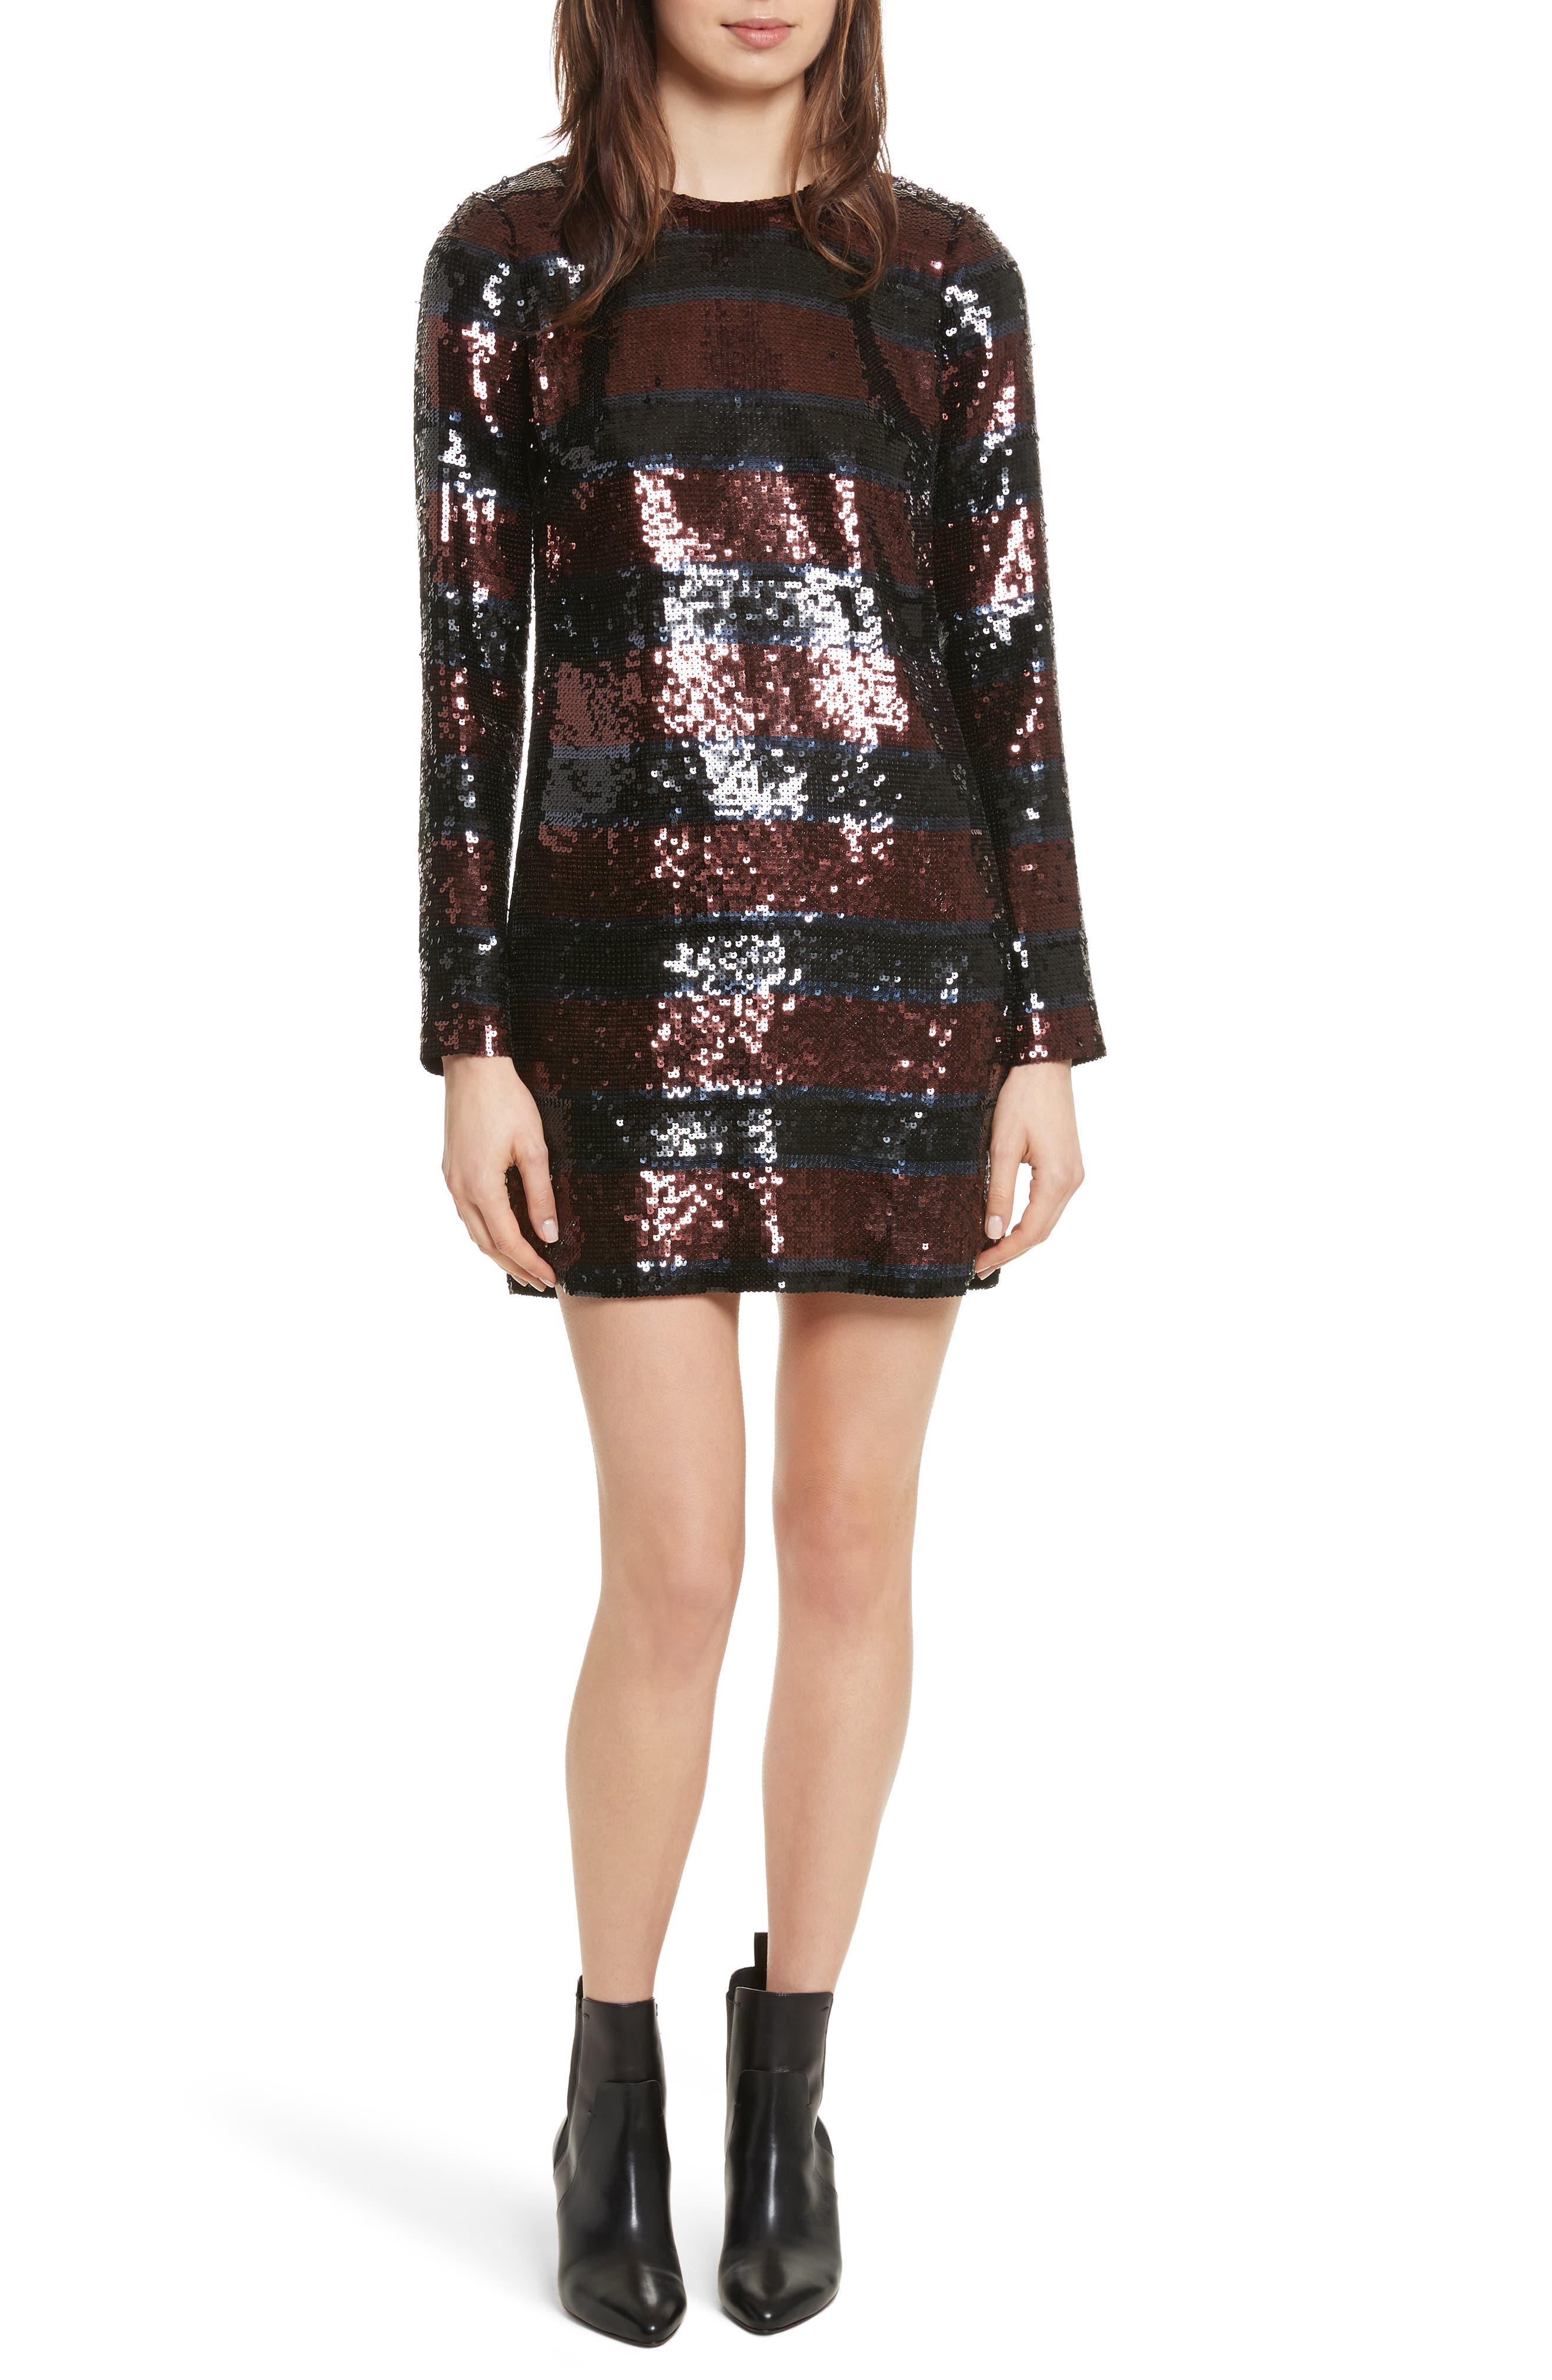 Breakers Sequin Dress,                         Main,                         color, 931